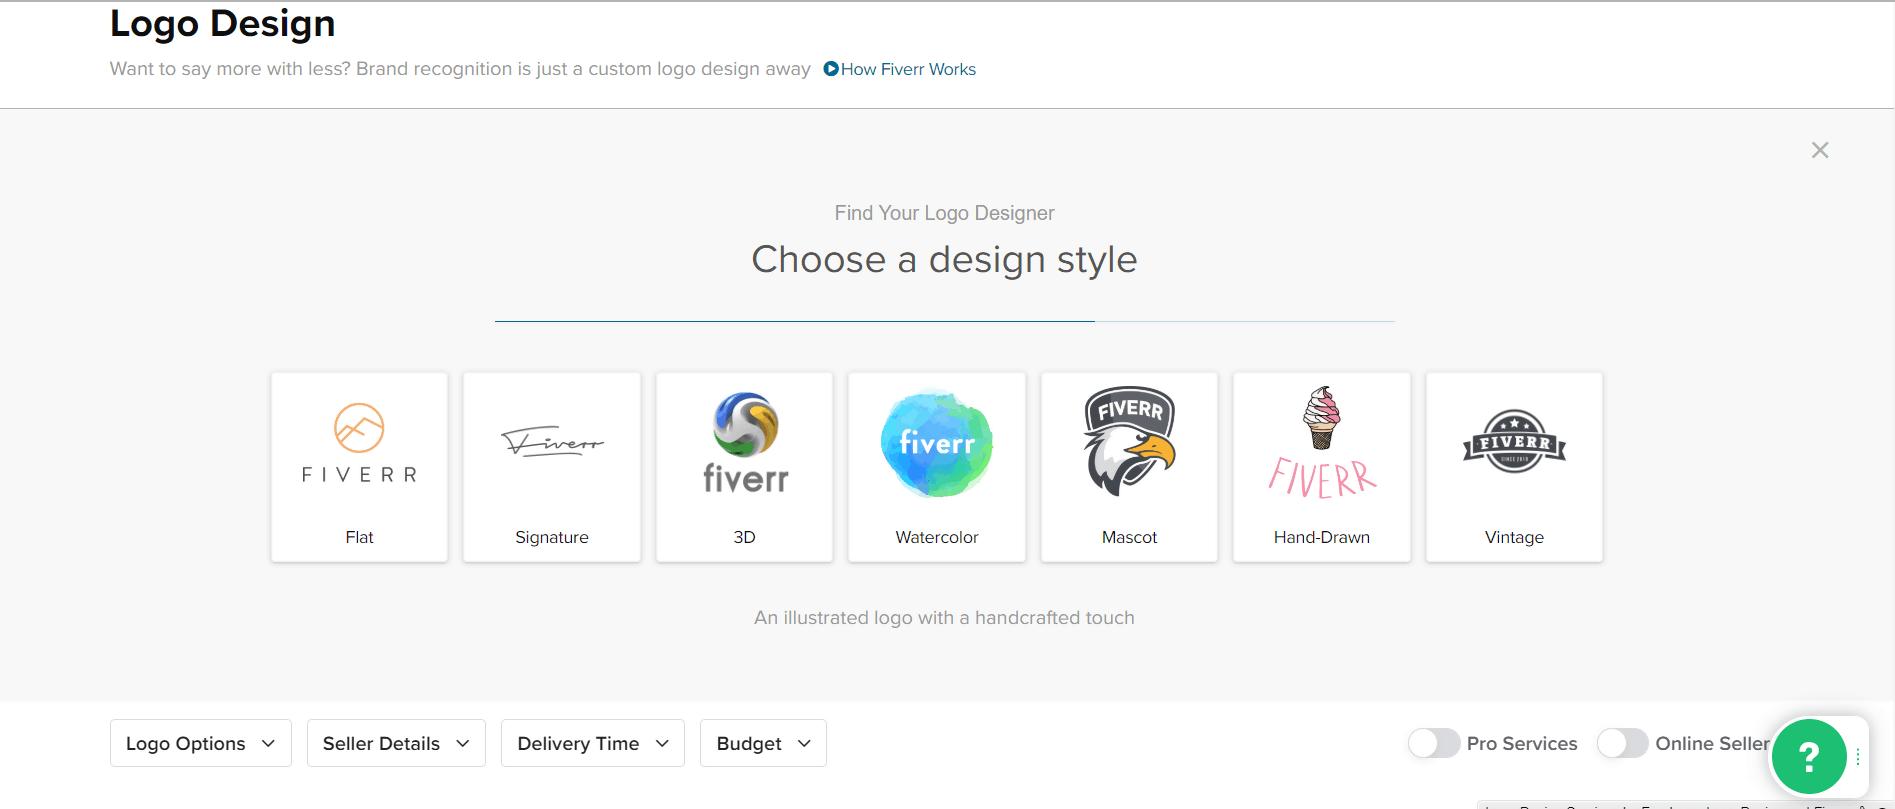 Fiverr screenshot - Choose a design style